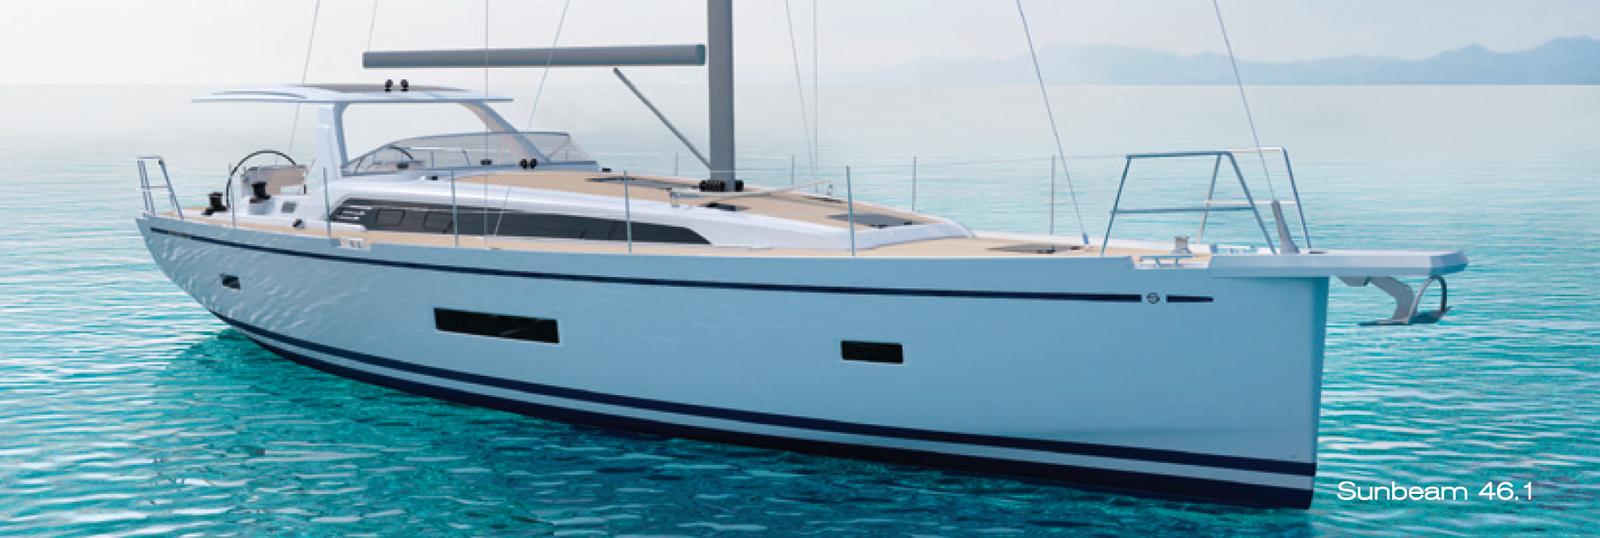 Das neue Flaggschiff - SUNBEAM 46.1!